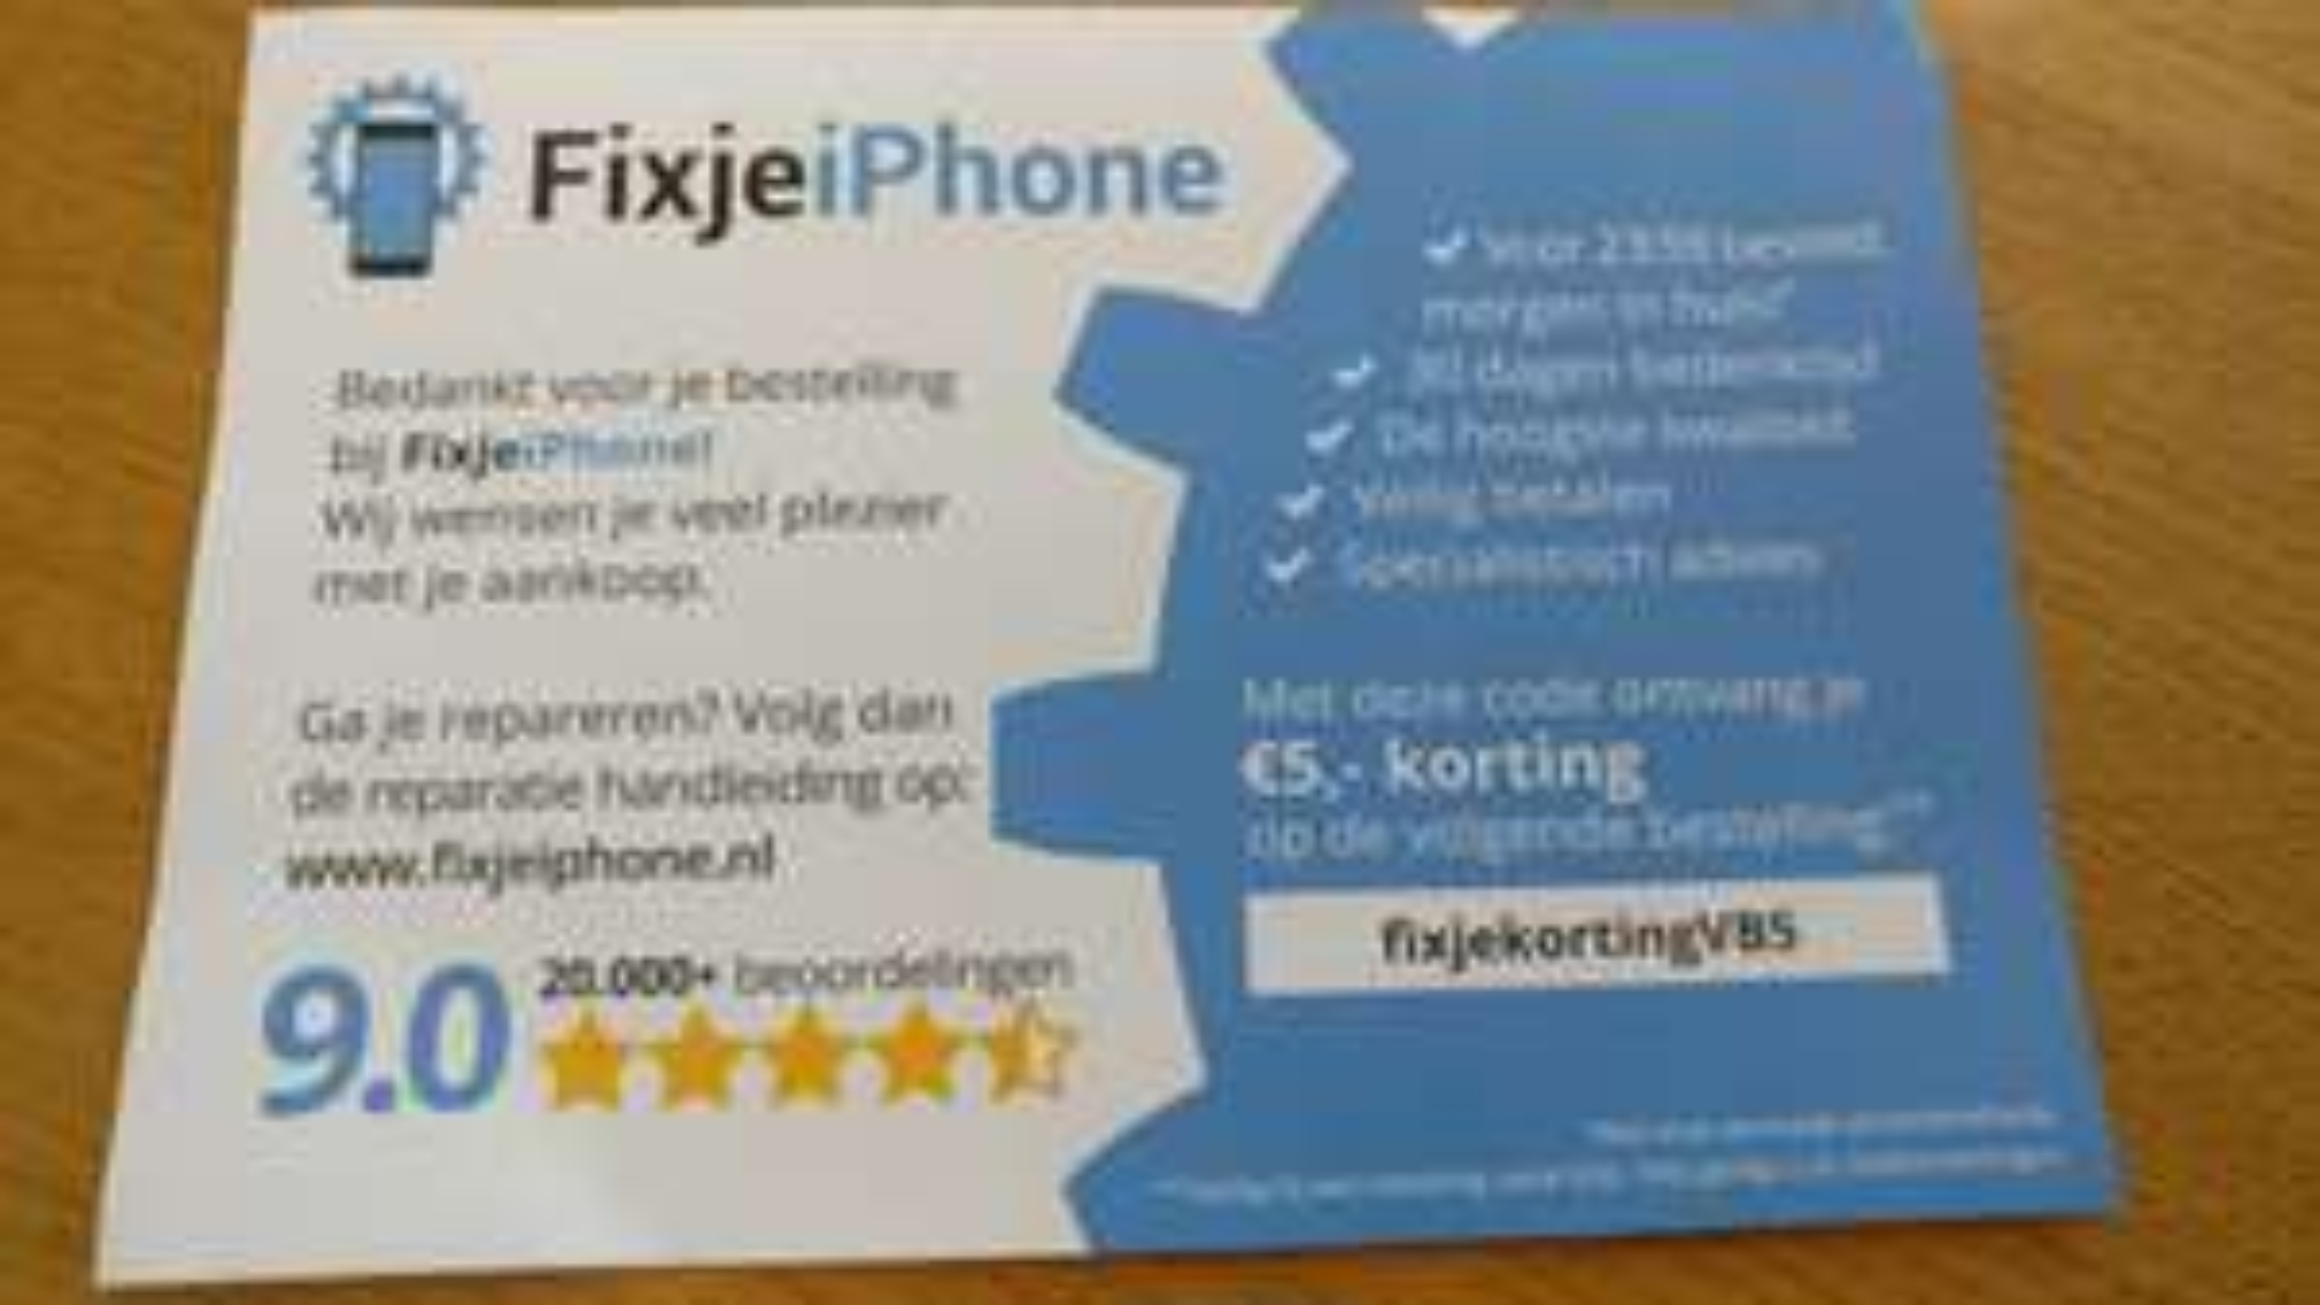 Fixjeiphone.nl 5 euro korting